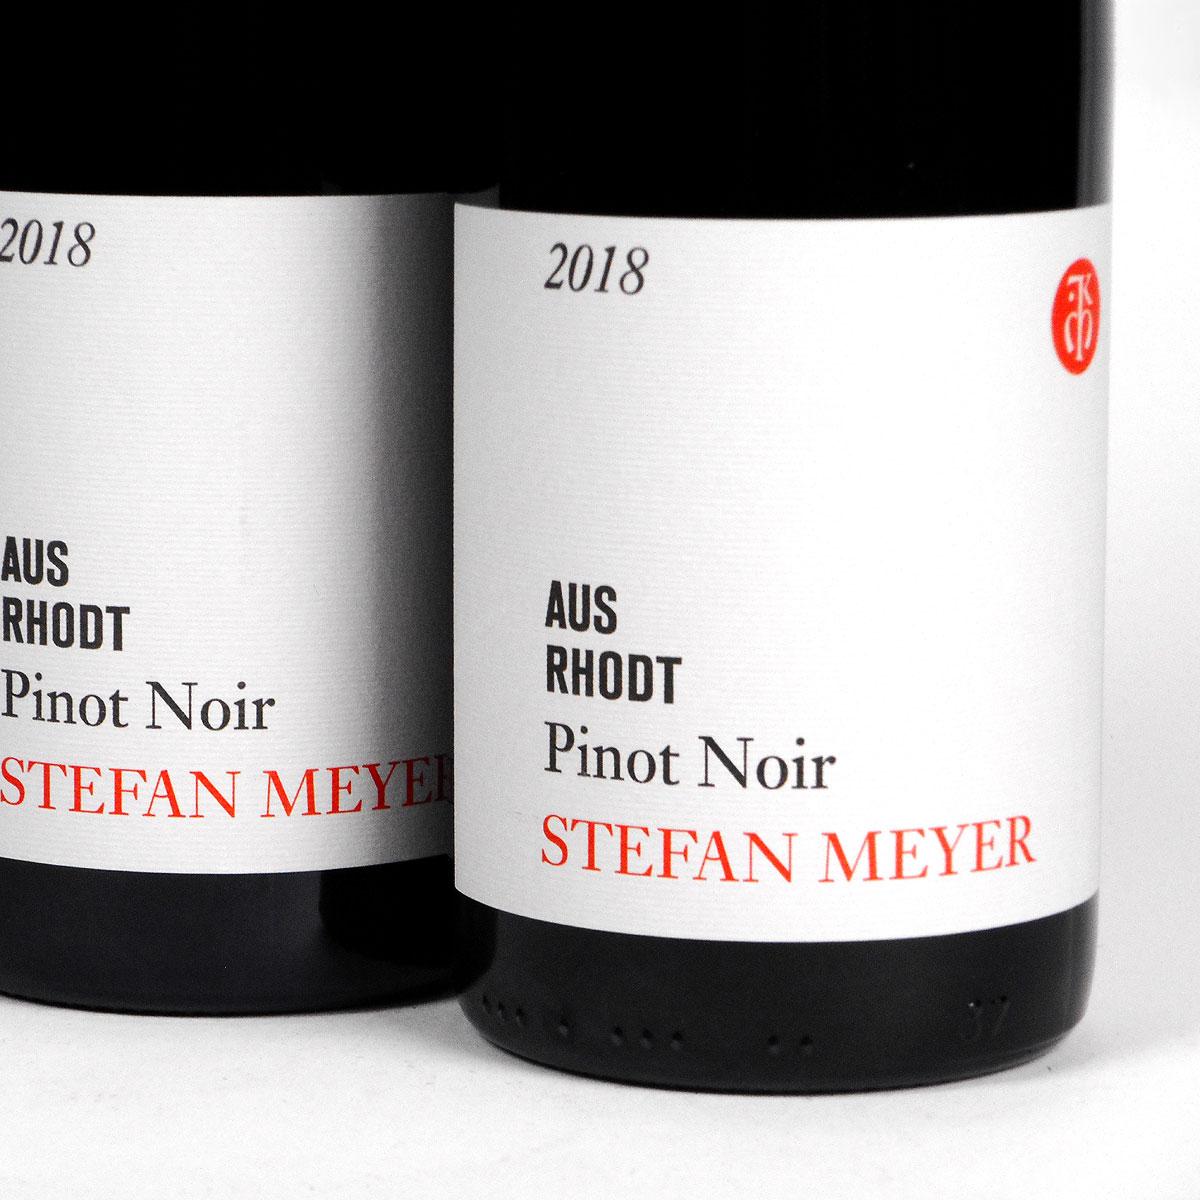 Pfalz: Stefan Meyer 'Aus Rhodt' Pinot Noir 2018